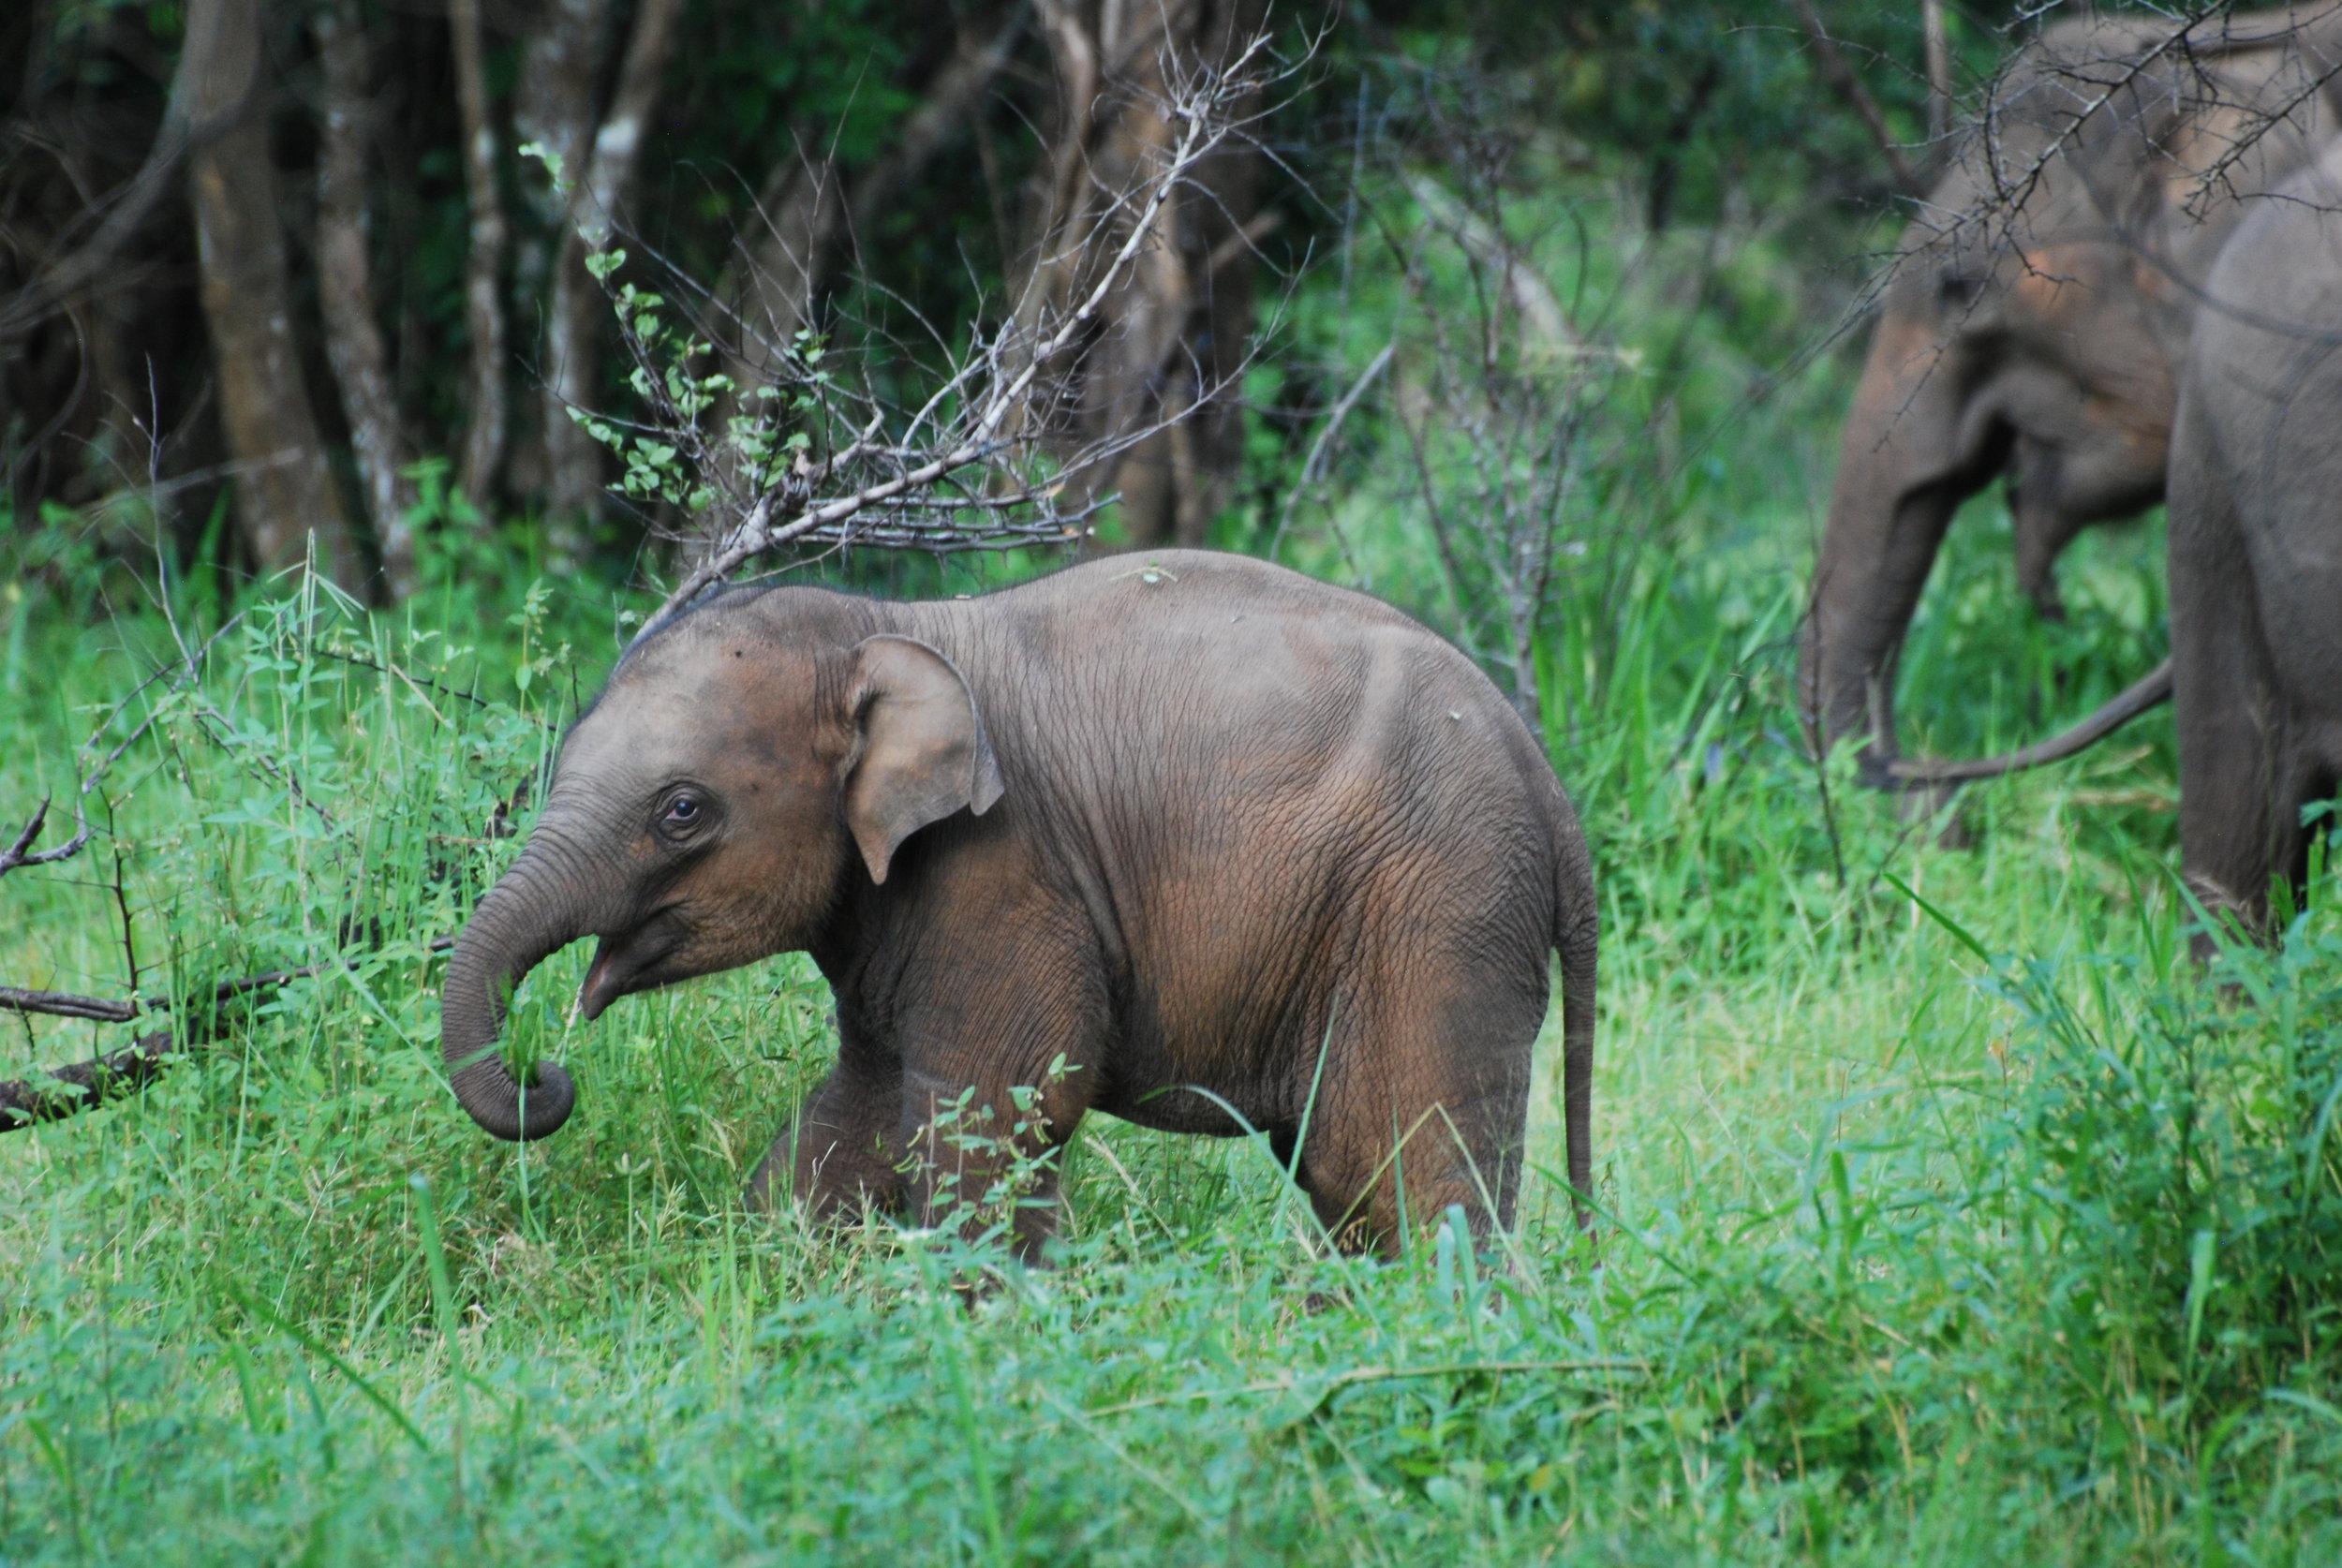 Baby photo #1: Male elephant calf, Wasgamuwa National Park, Sri Lanka (25 Dec 2018). Photo by Chase LaDue.